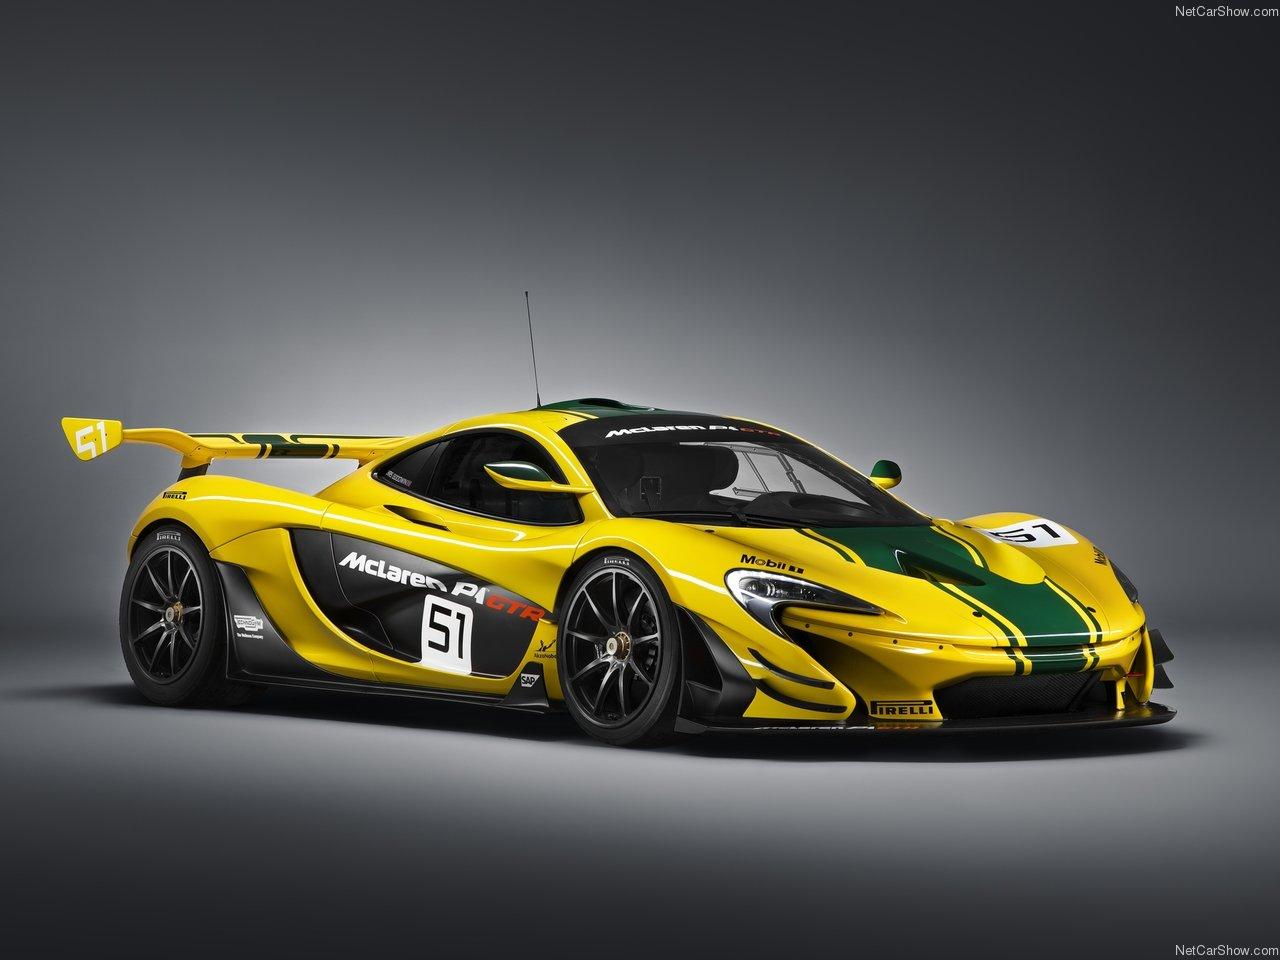 McLaren-P1_GTR_2015_1280x960_wallpaper_01.jpg